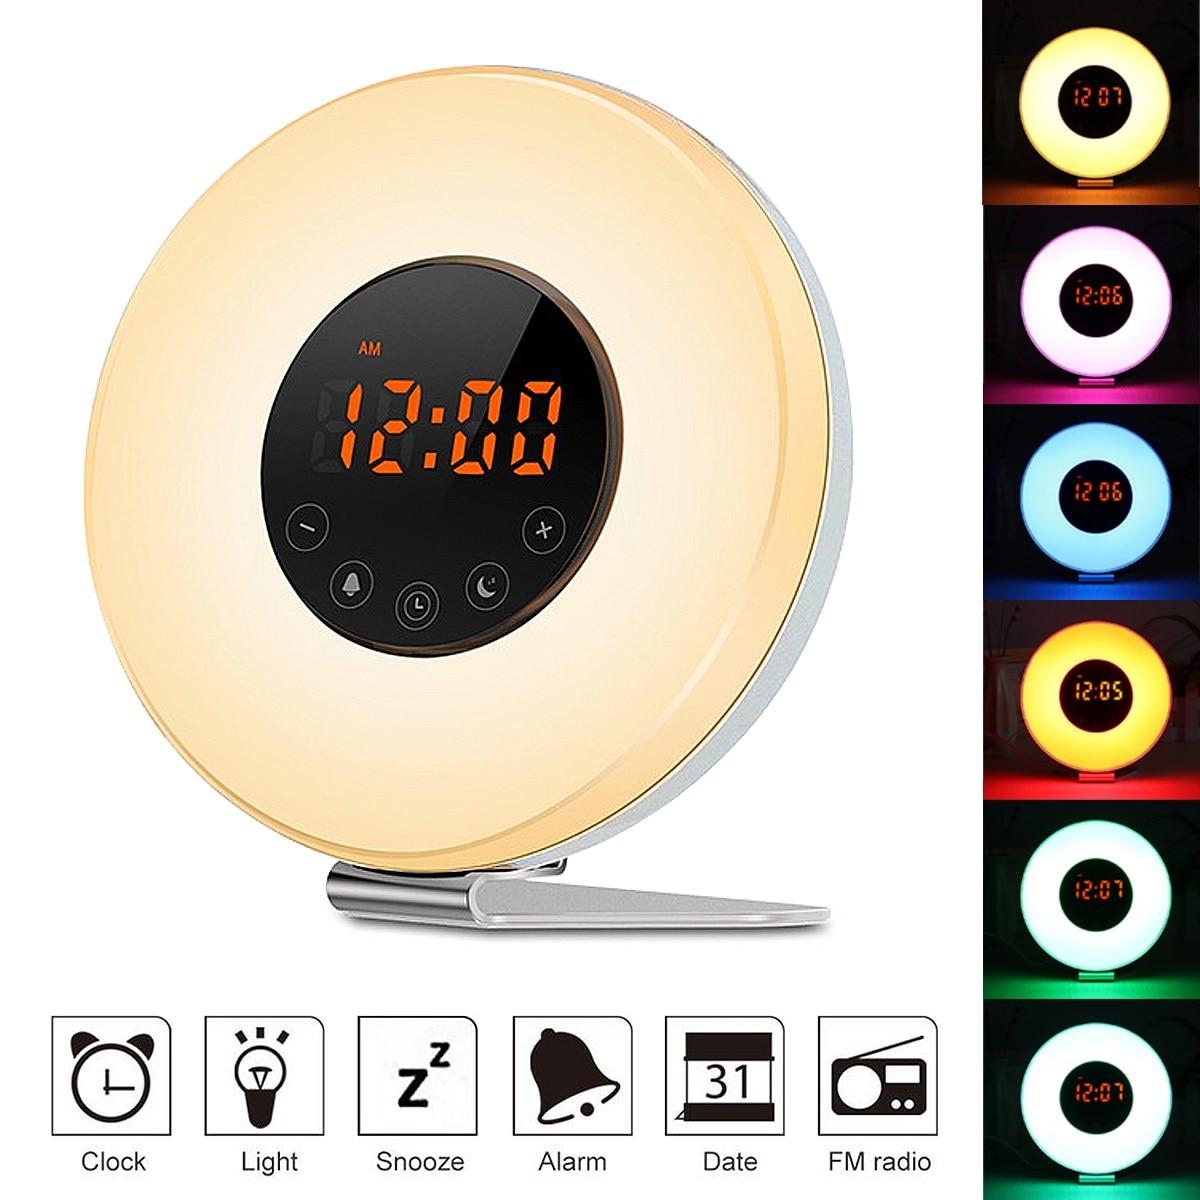 LED Wake-up Light Sunrise Alarm Clock FM Radio Bedside USB Mood Night Lamp Colorful Light Changable 7 Nature Sounds US Plug недорого